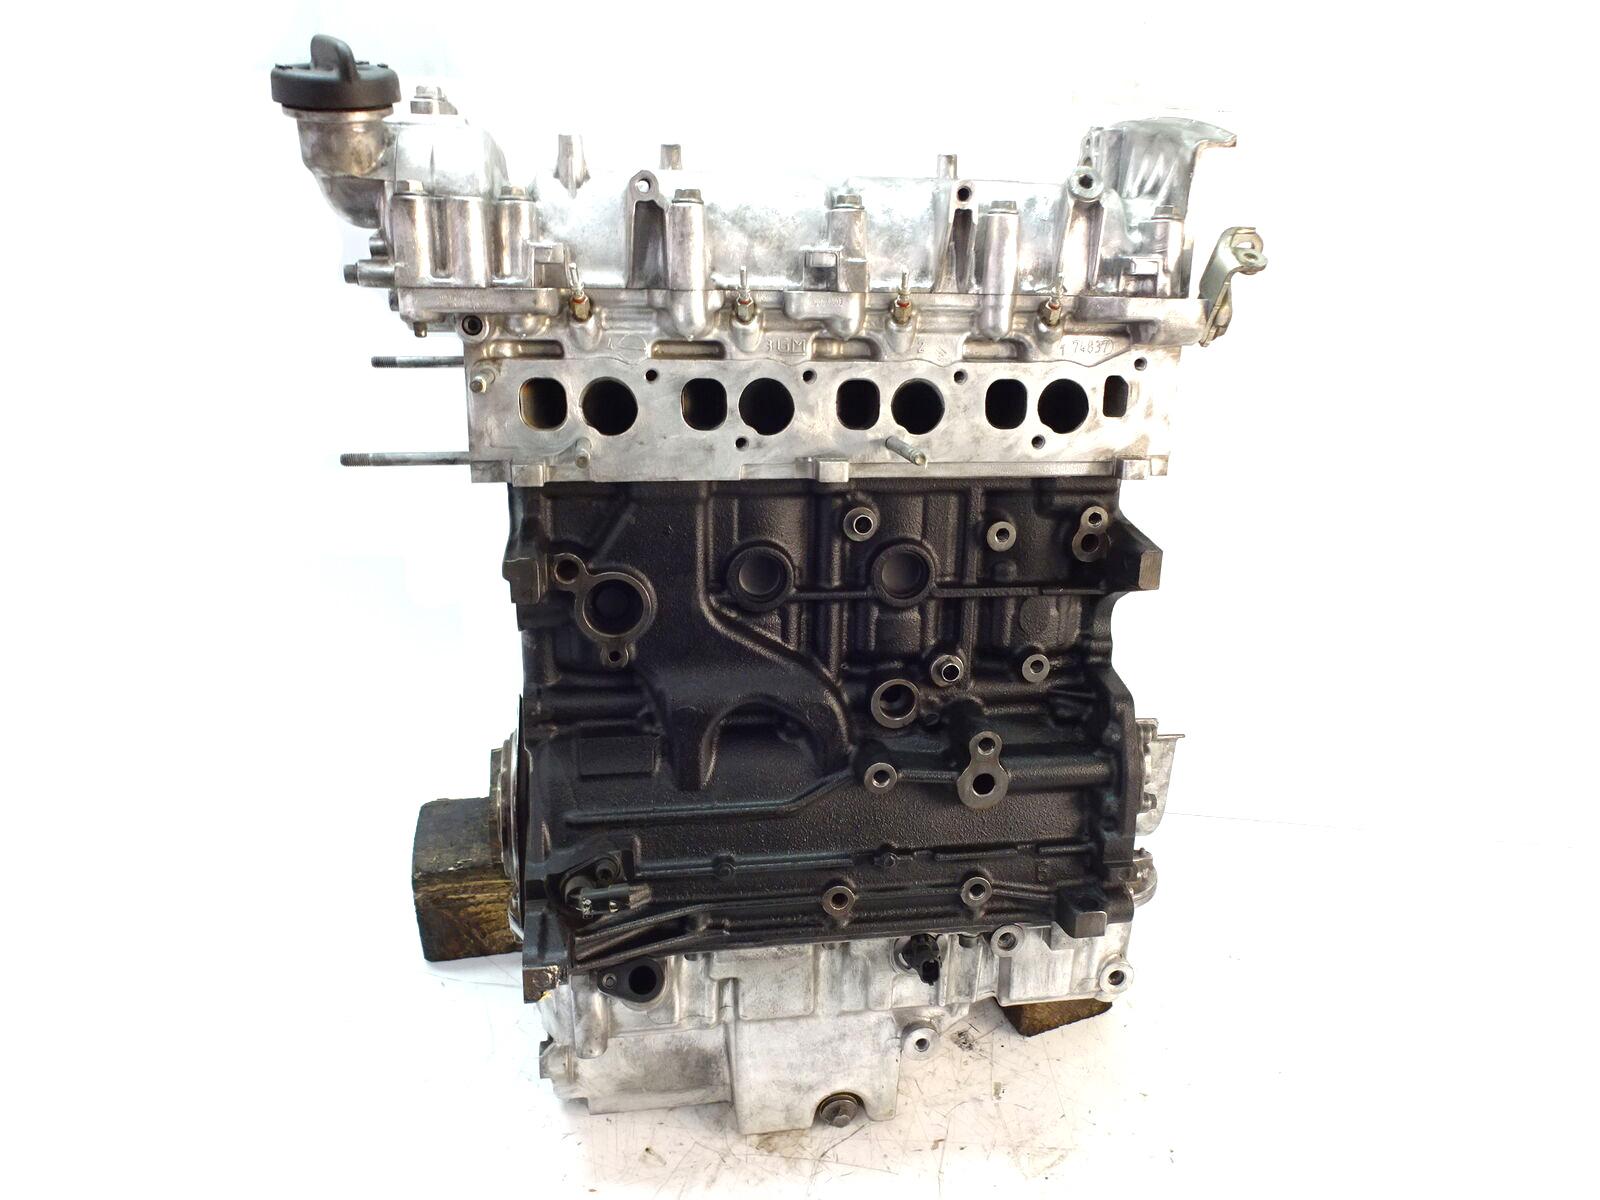 Motor Opel Saab Astra Cascada W13 Insignia Zafira 9-5 2,0 CDTI DE318974